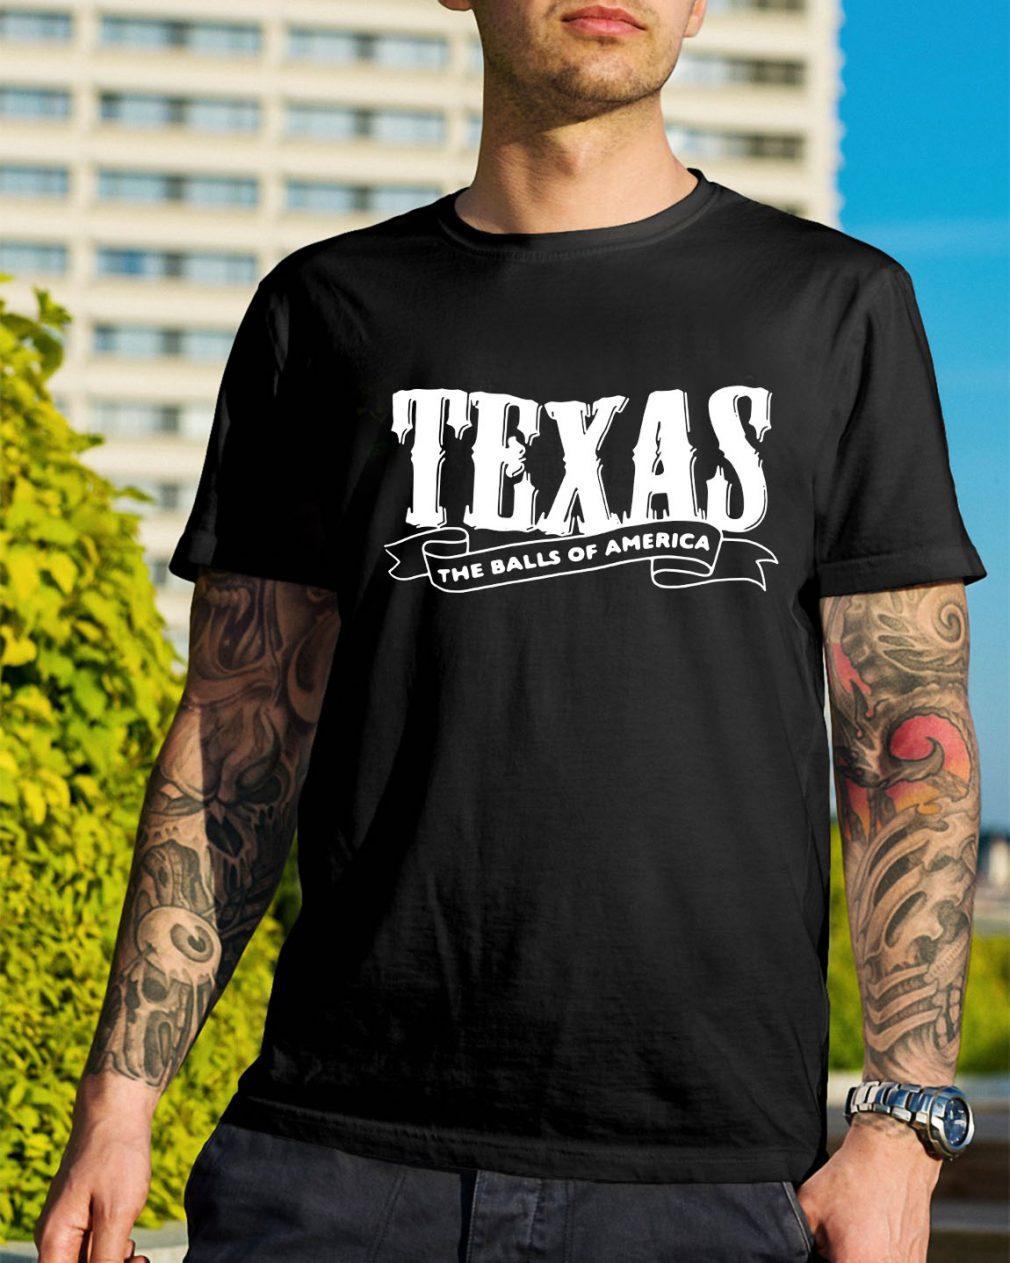 Texas the balls of America shirt